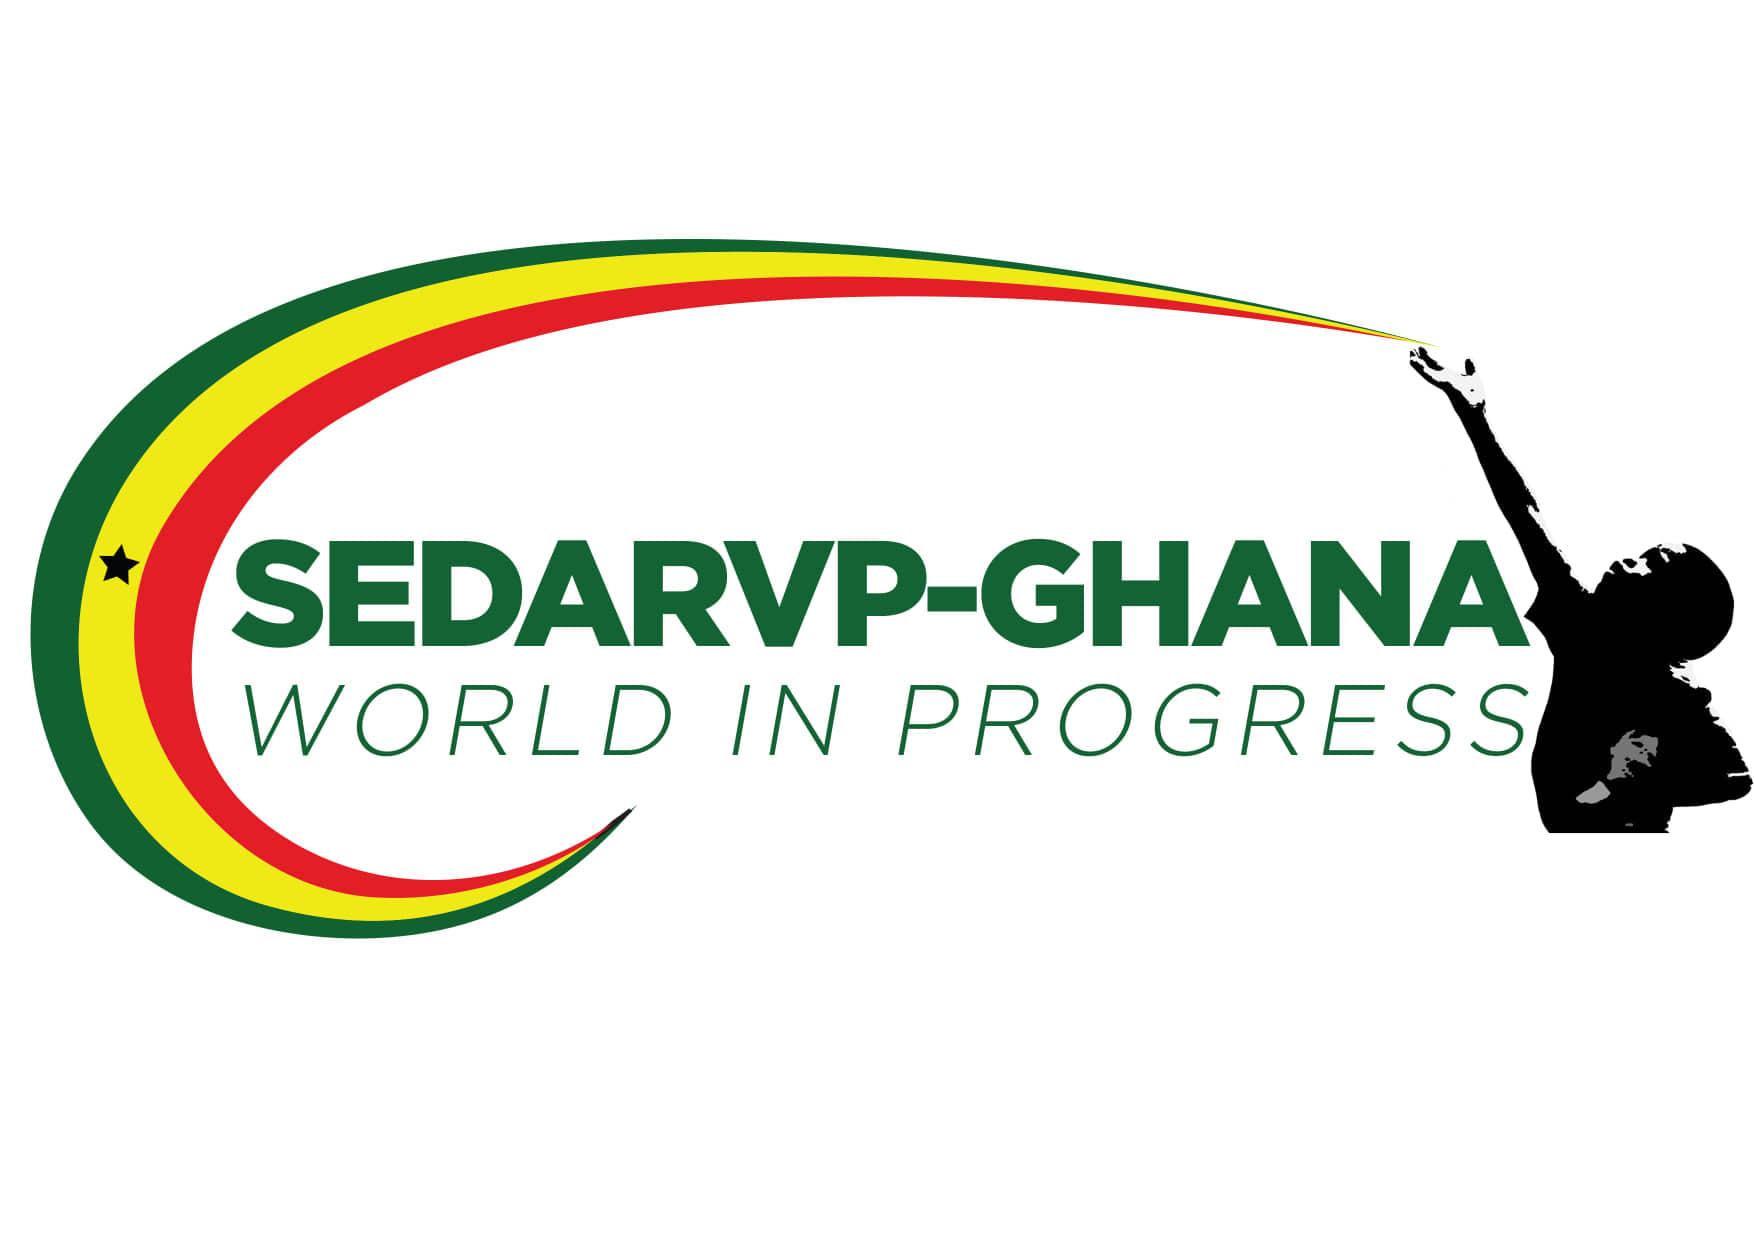 SEDARVP GHANA